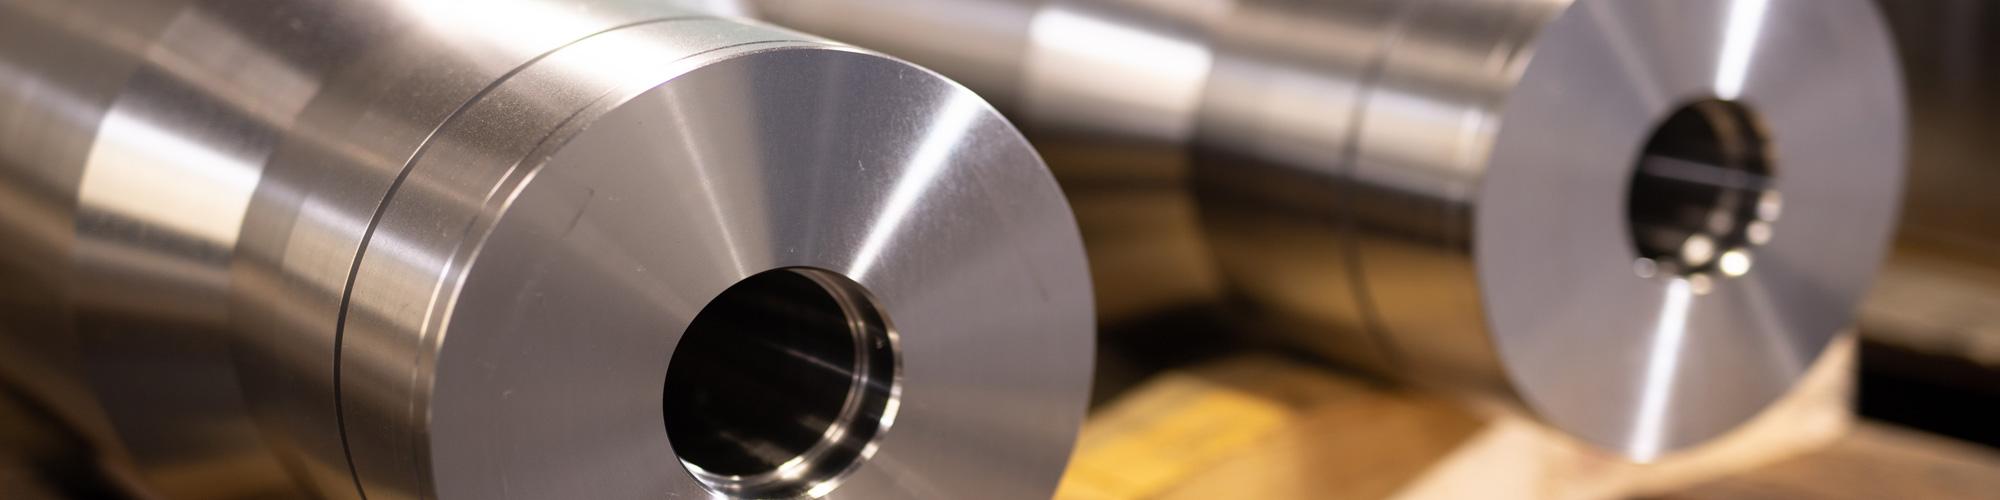 Geukes GmbH - Maschinenbau - Drehbearbeitung